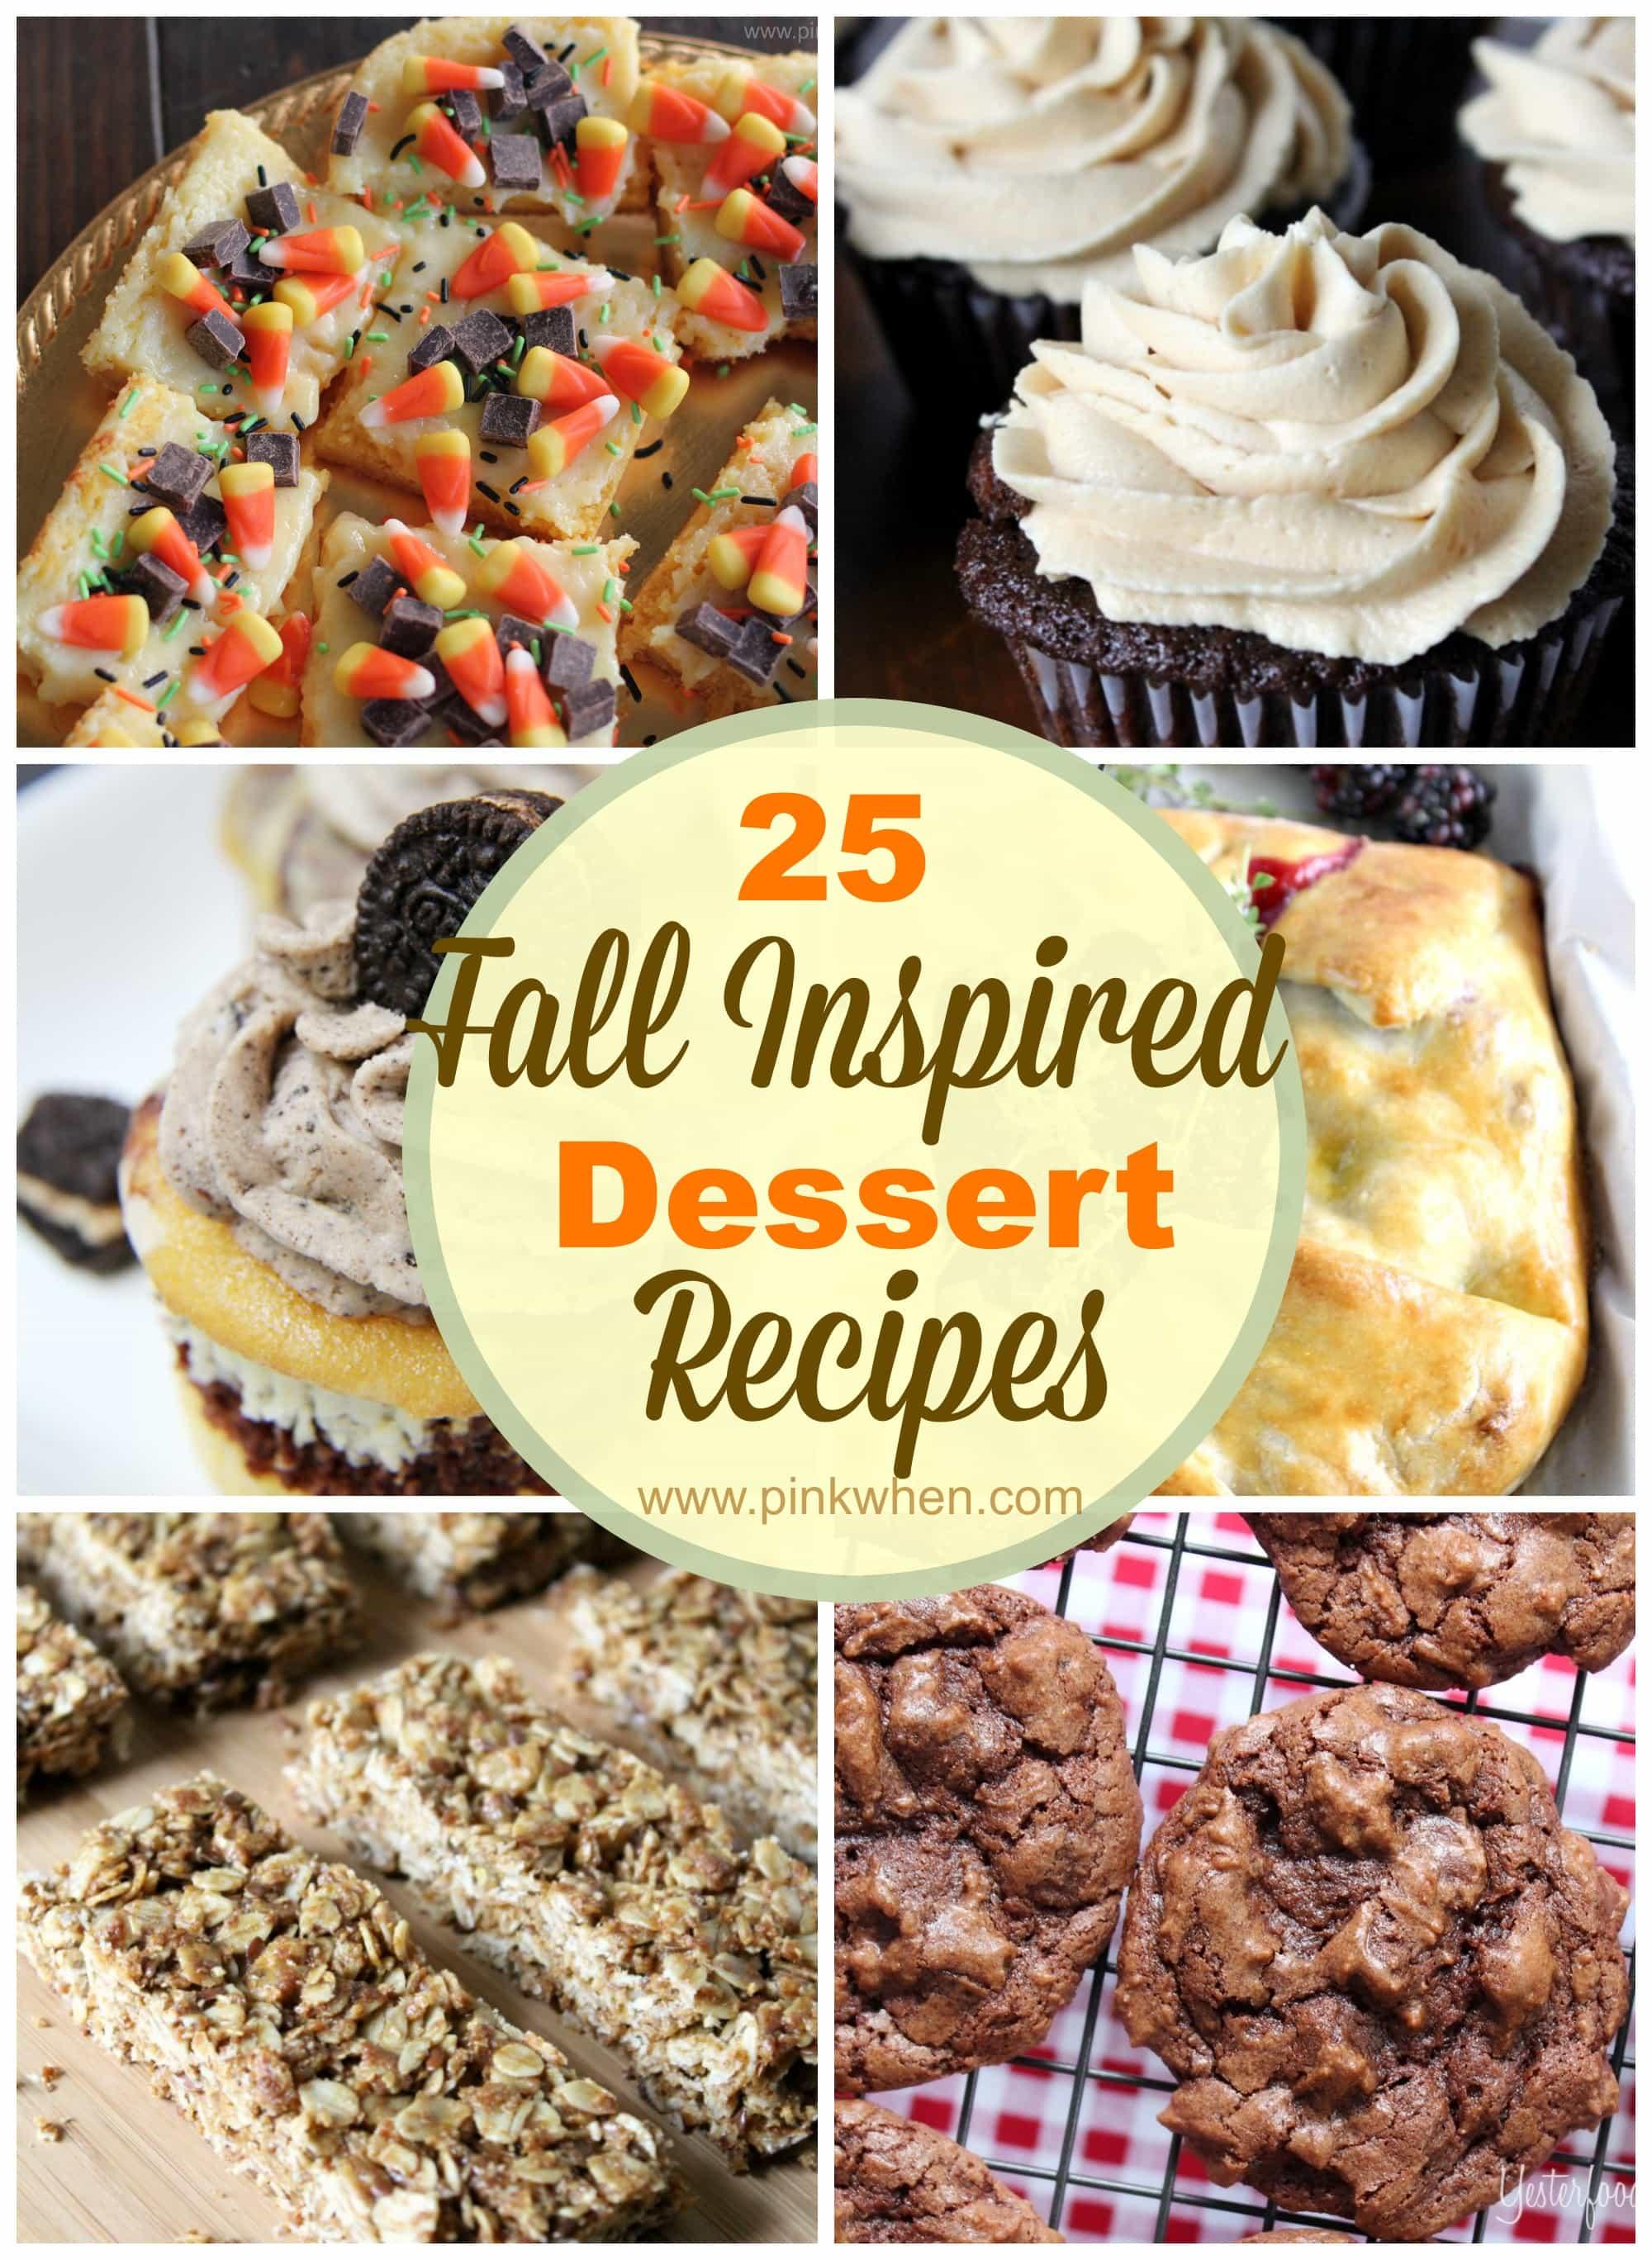 25 Fall Inspired Dessert Recipes via PinkWhen.com